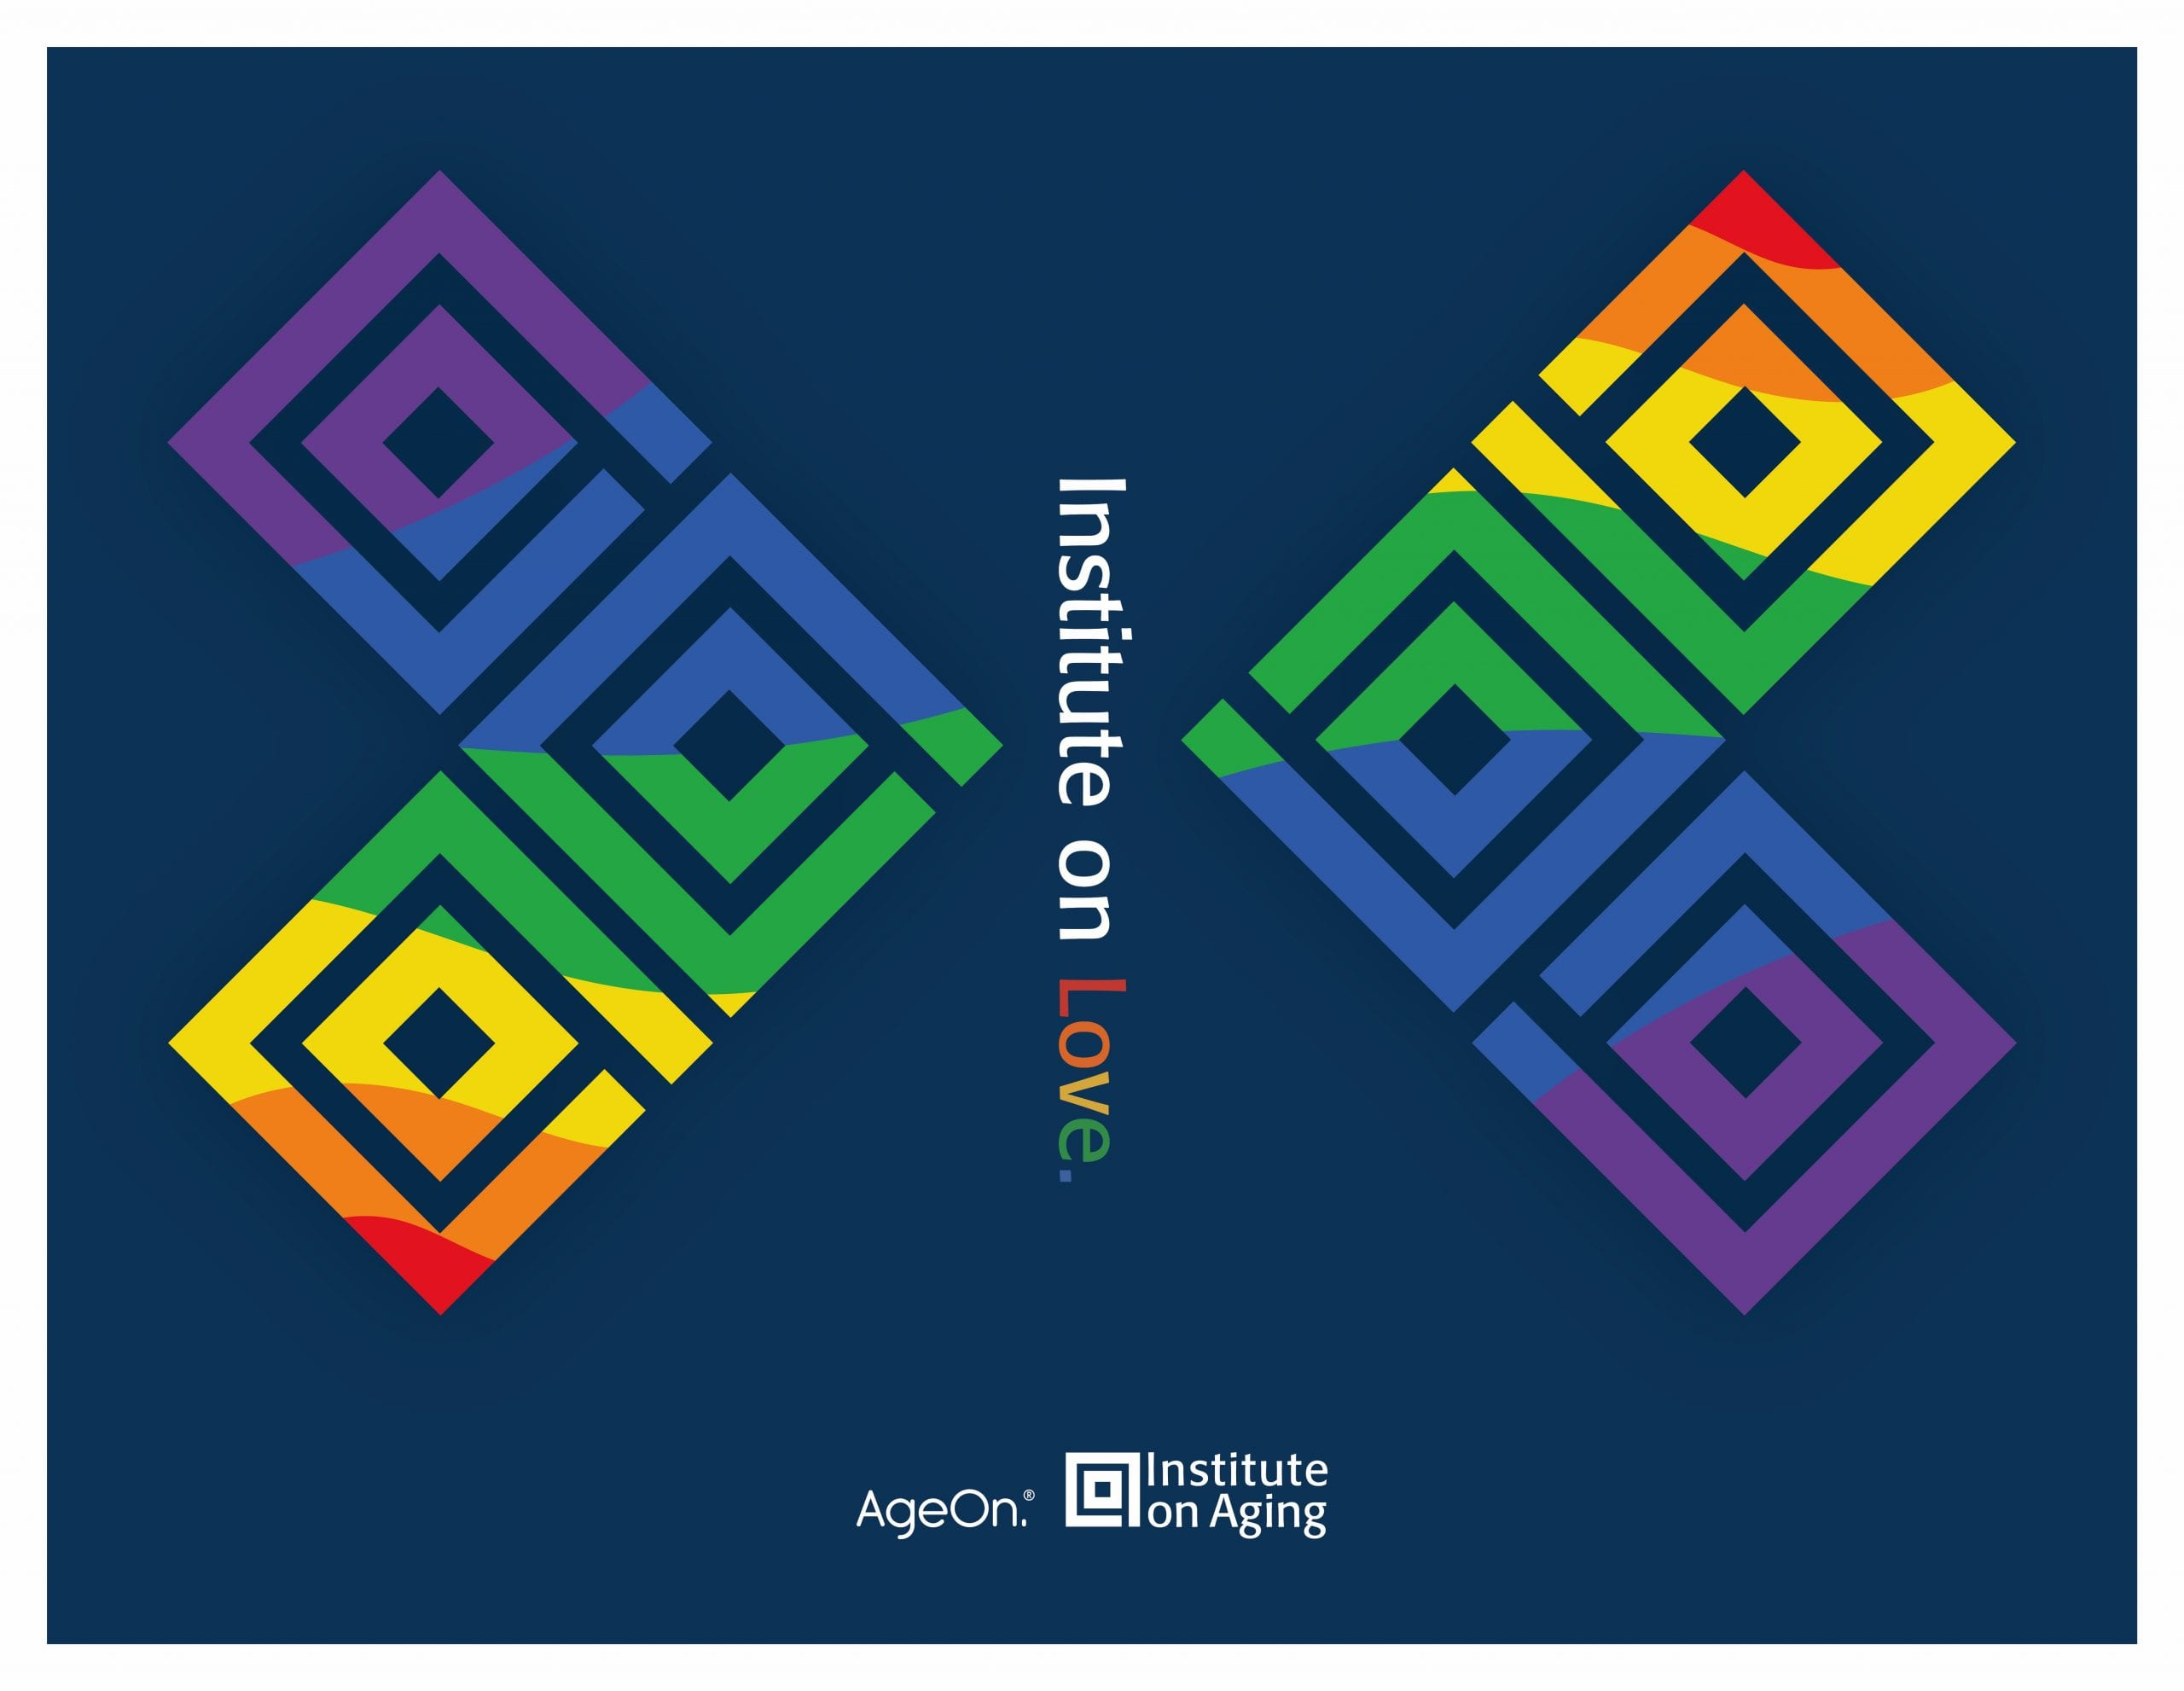 ioa_pride_gearysignage2ndfloor_46dot5x36h_v1_052820-01